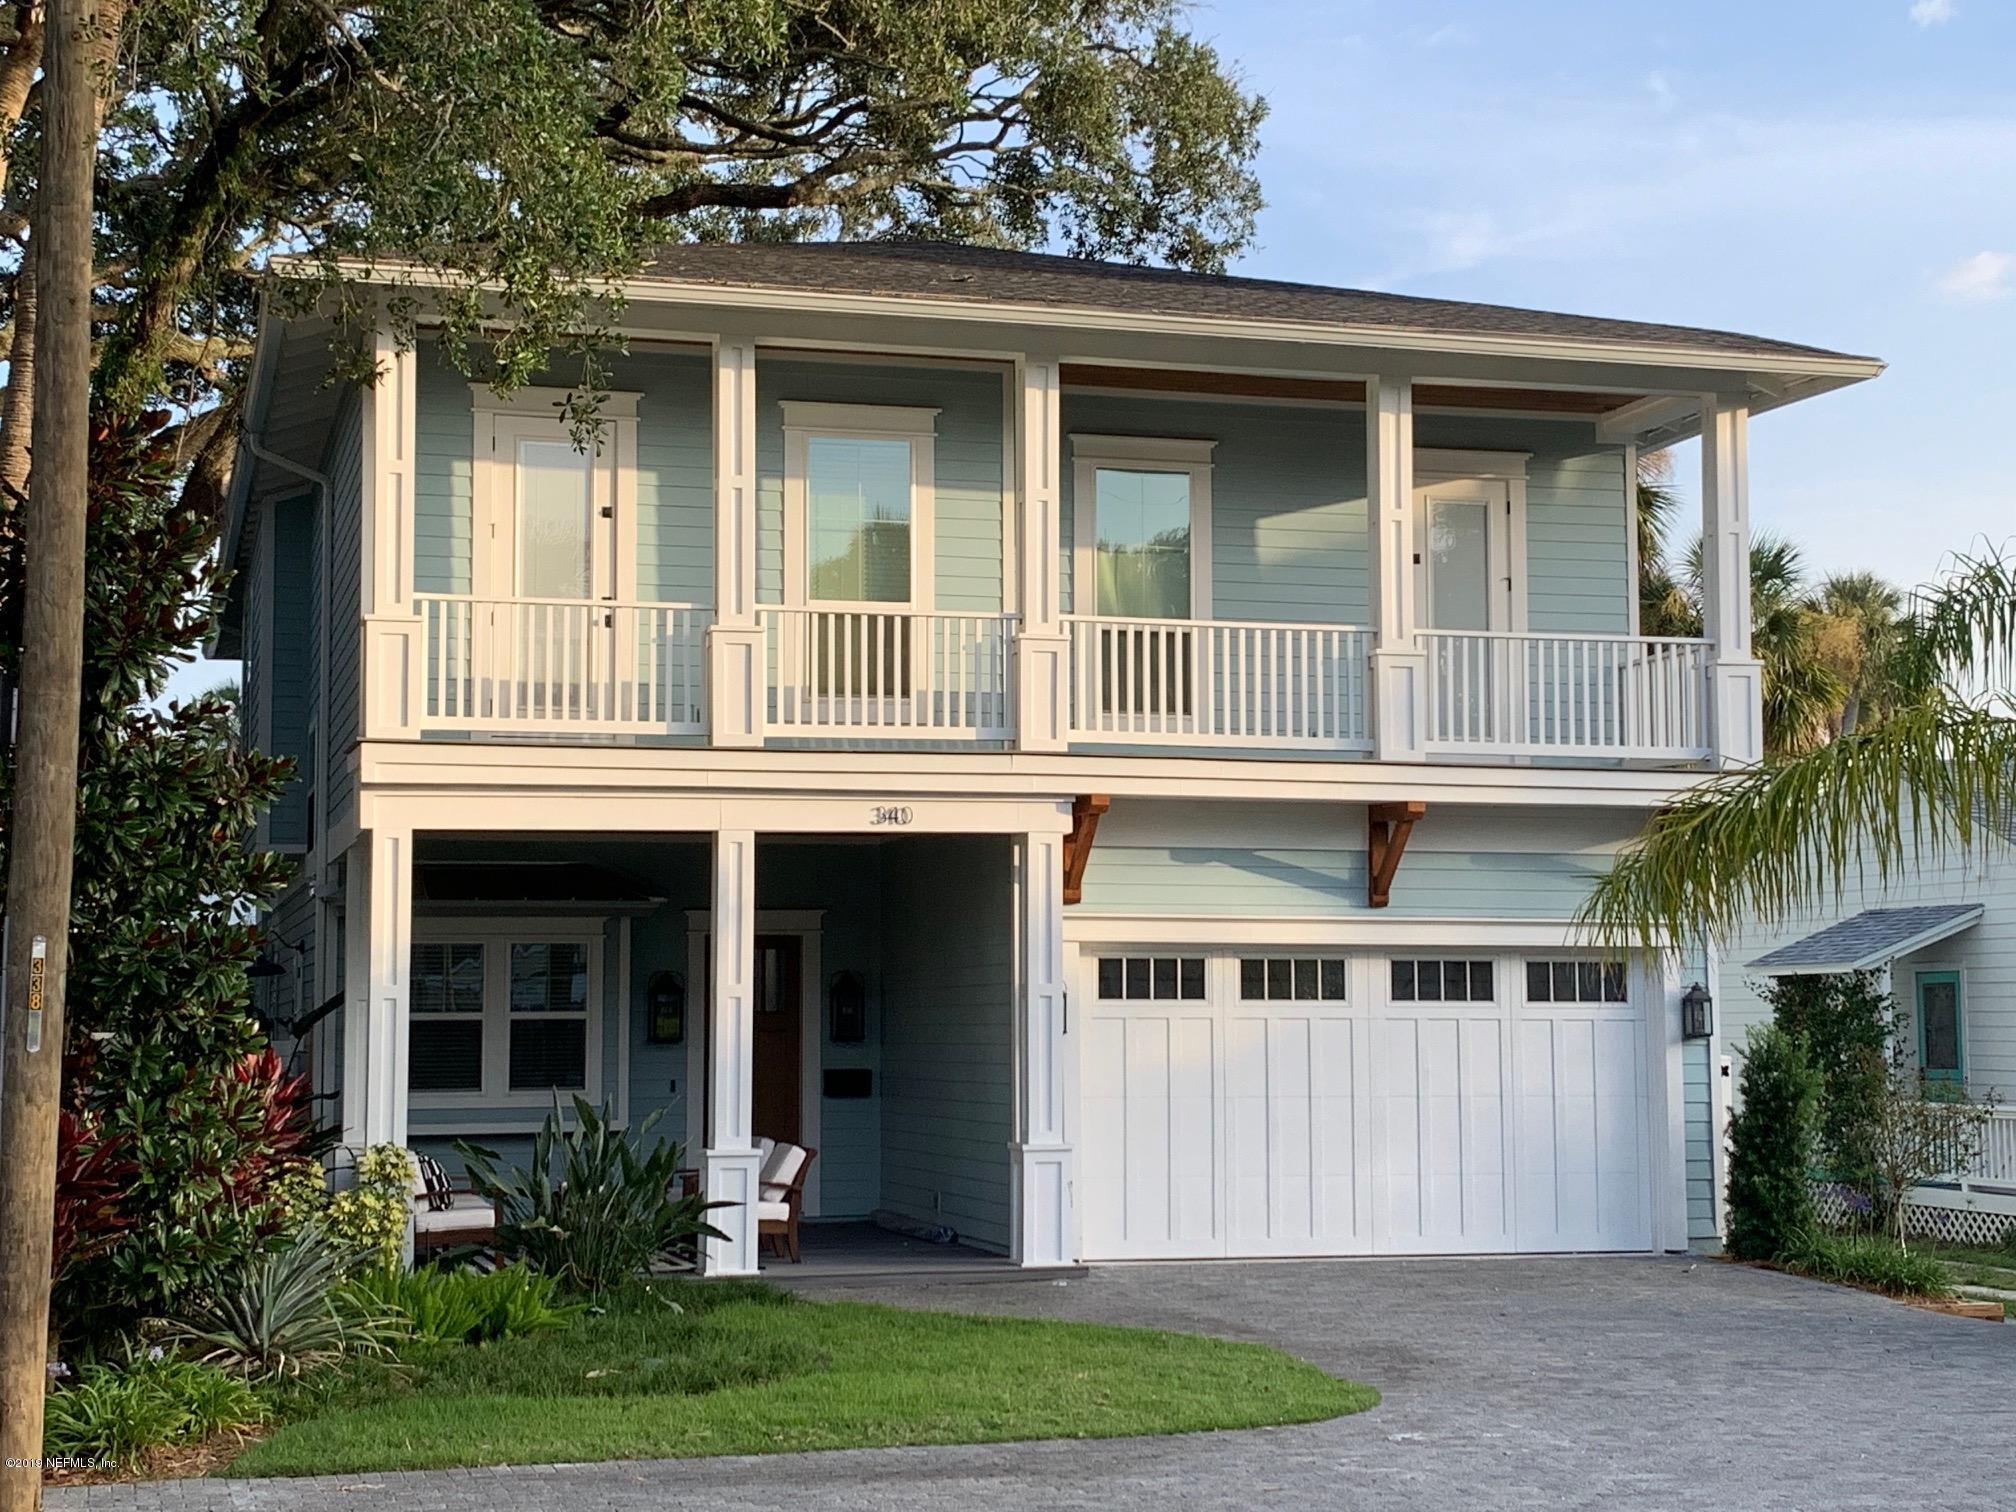 Photo of 340 8TH, ATLANTIC BEACH, FL 32233